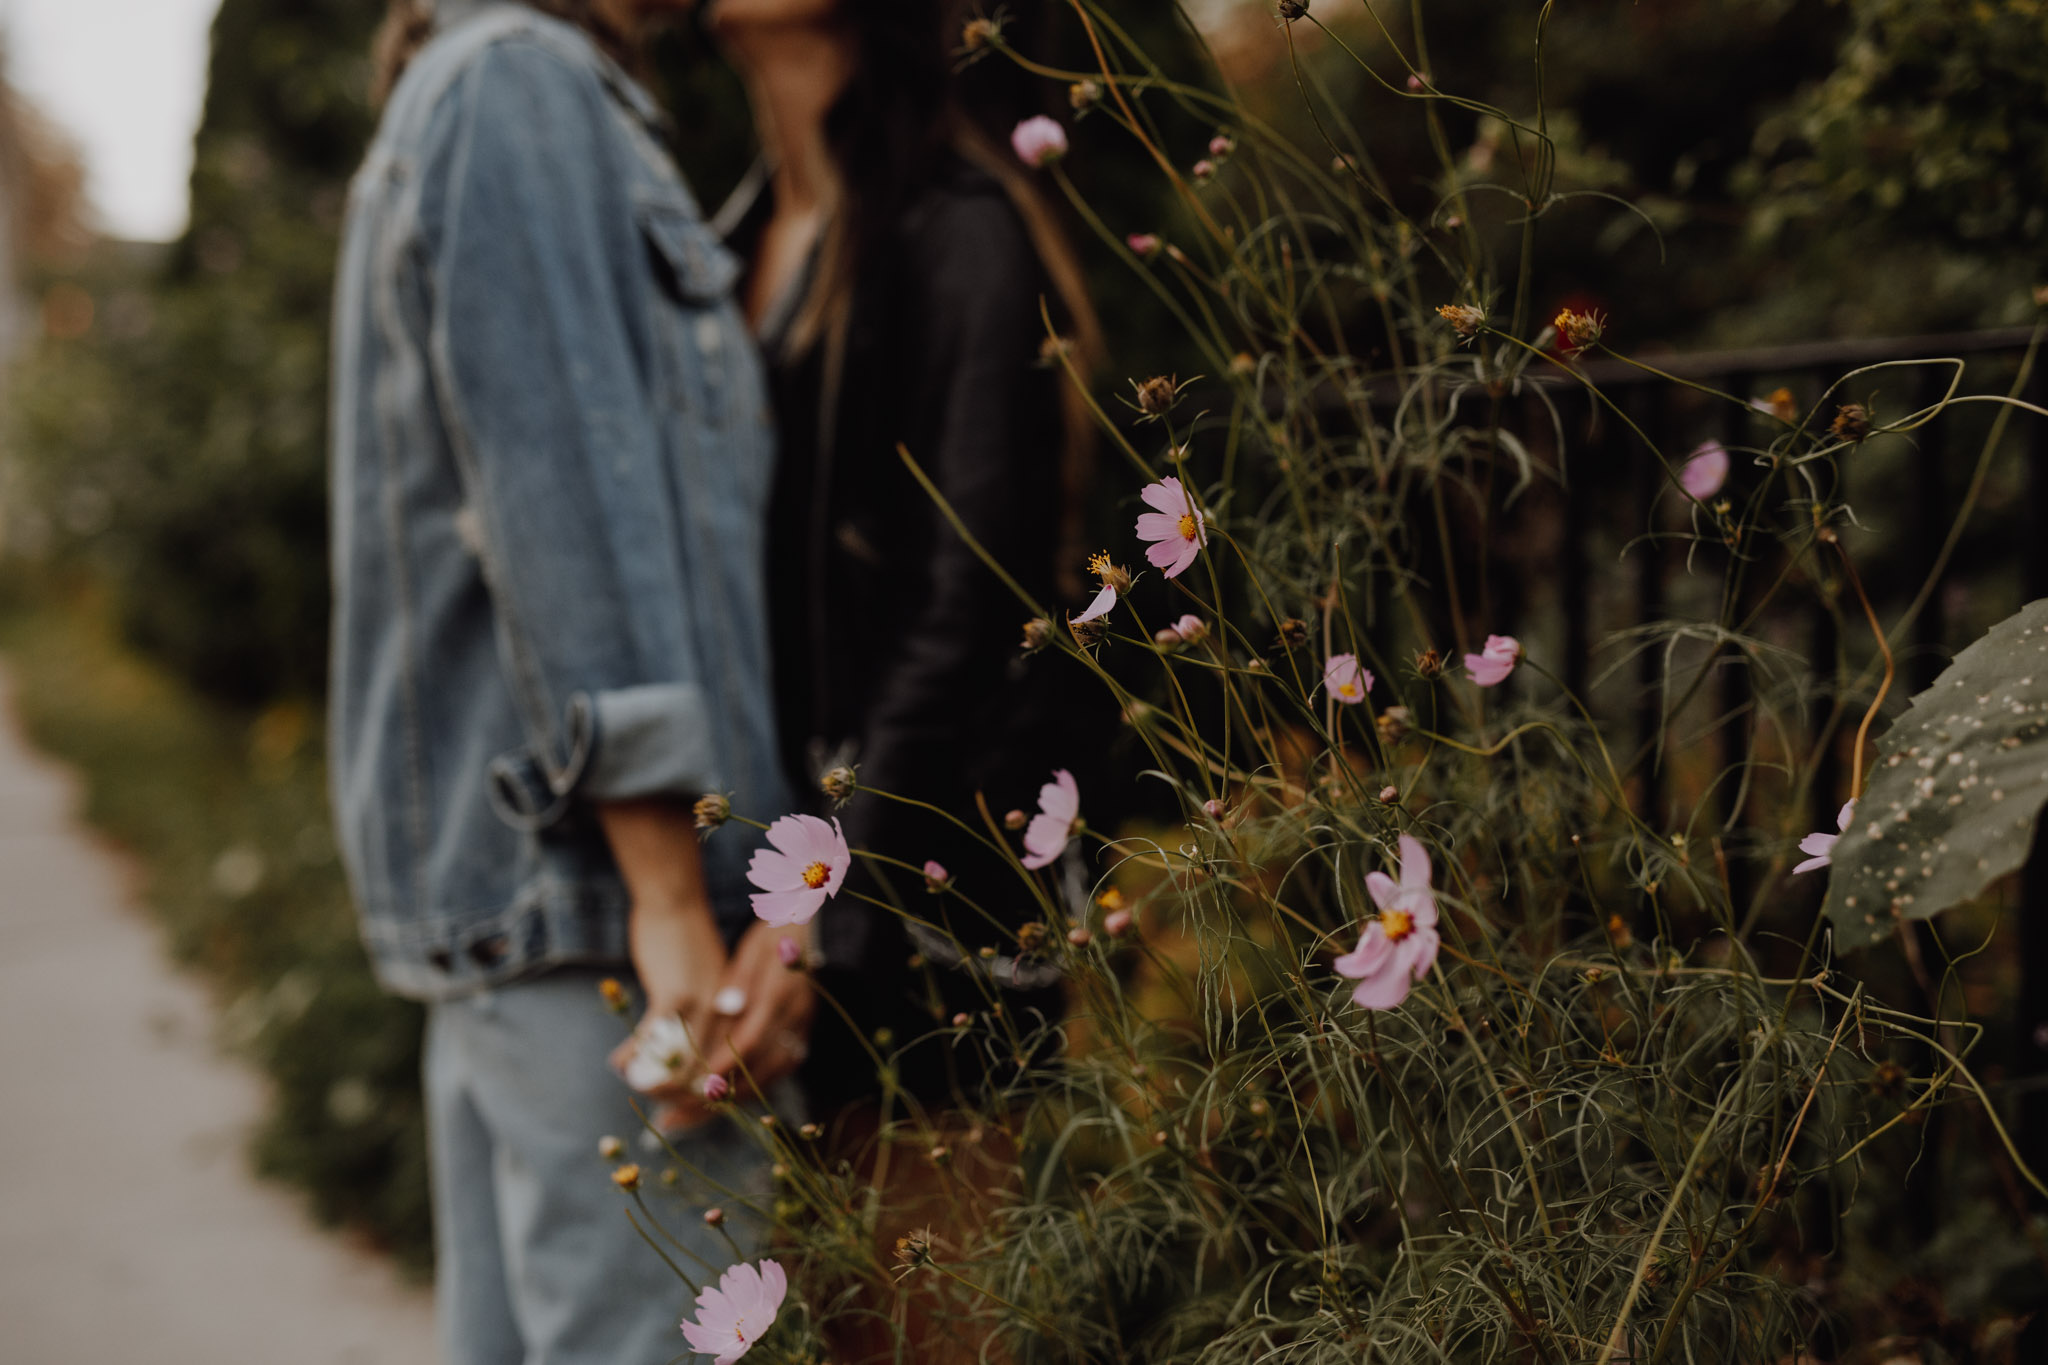 Mcdonalds engagement session - kisses in the garden